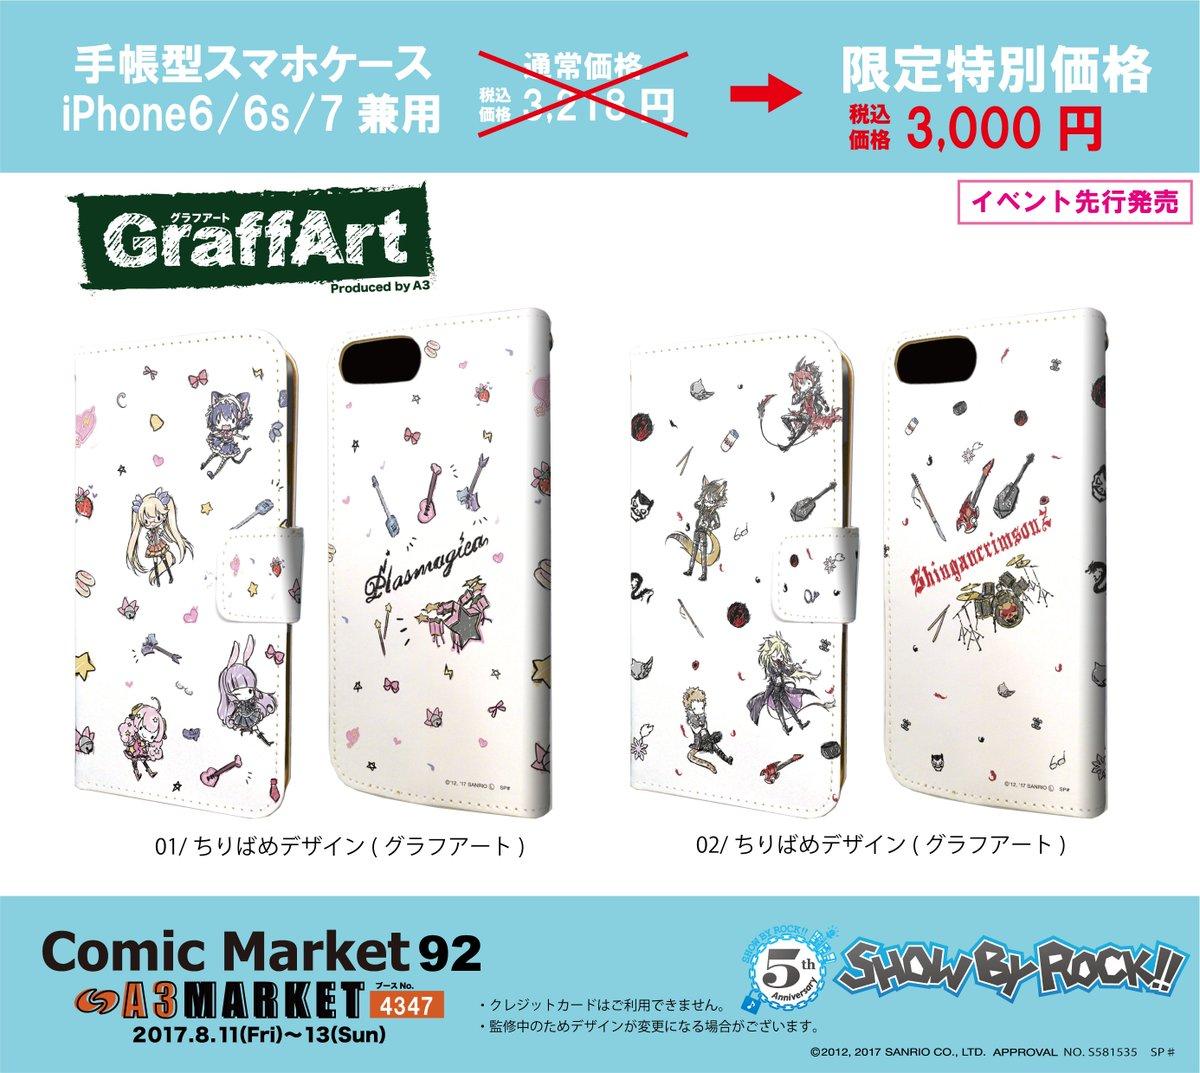 【C92事後販売】只今『A3 MARKET』にてGraffArtシリーズの手帳型スマホケース(iPhone用)「SHOW